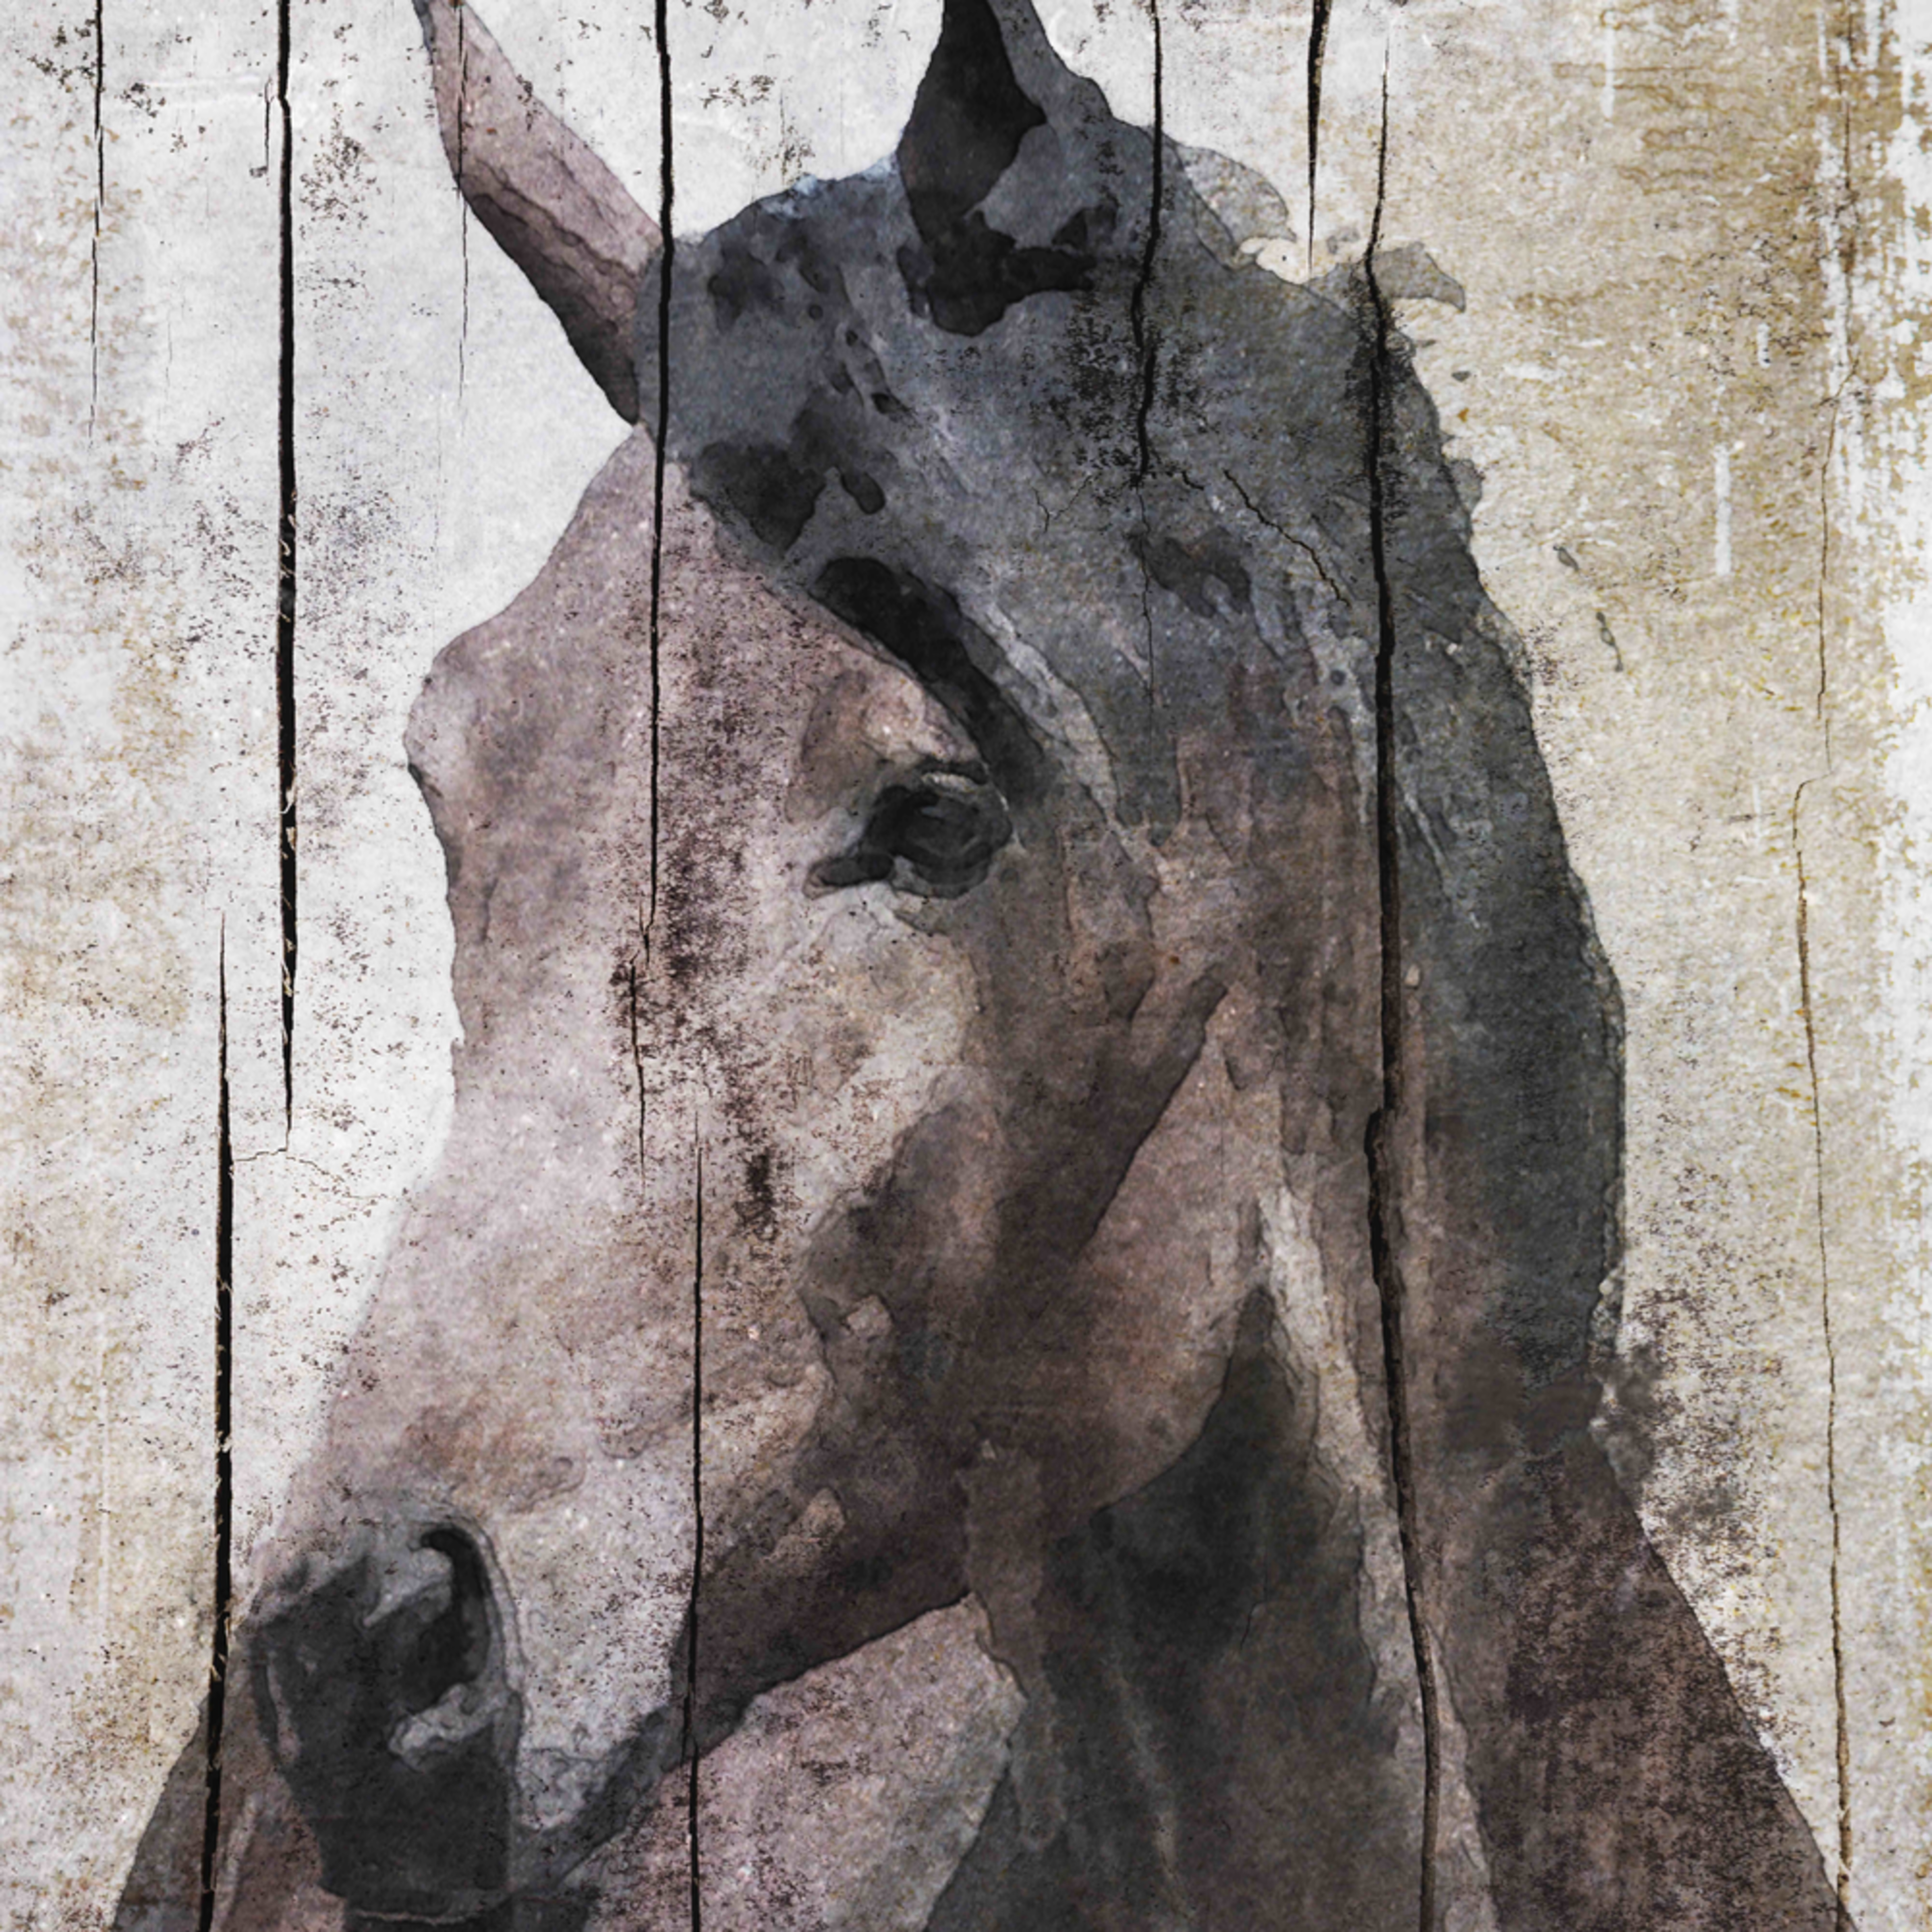 40x30 orl 2990 3 horse lemuse i2duvt